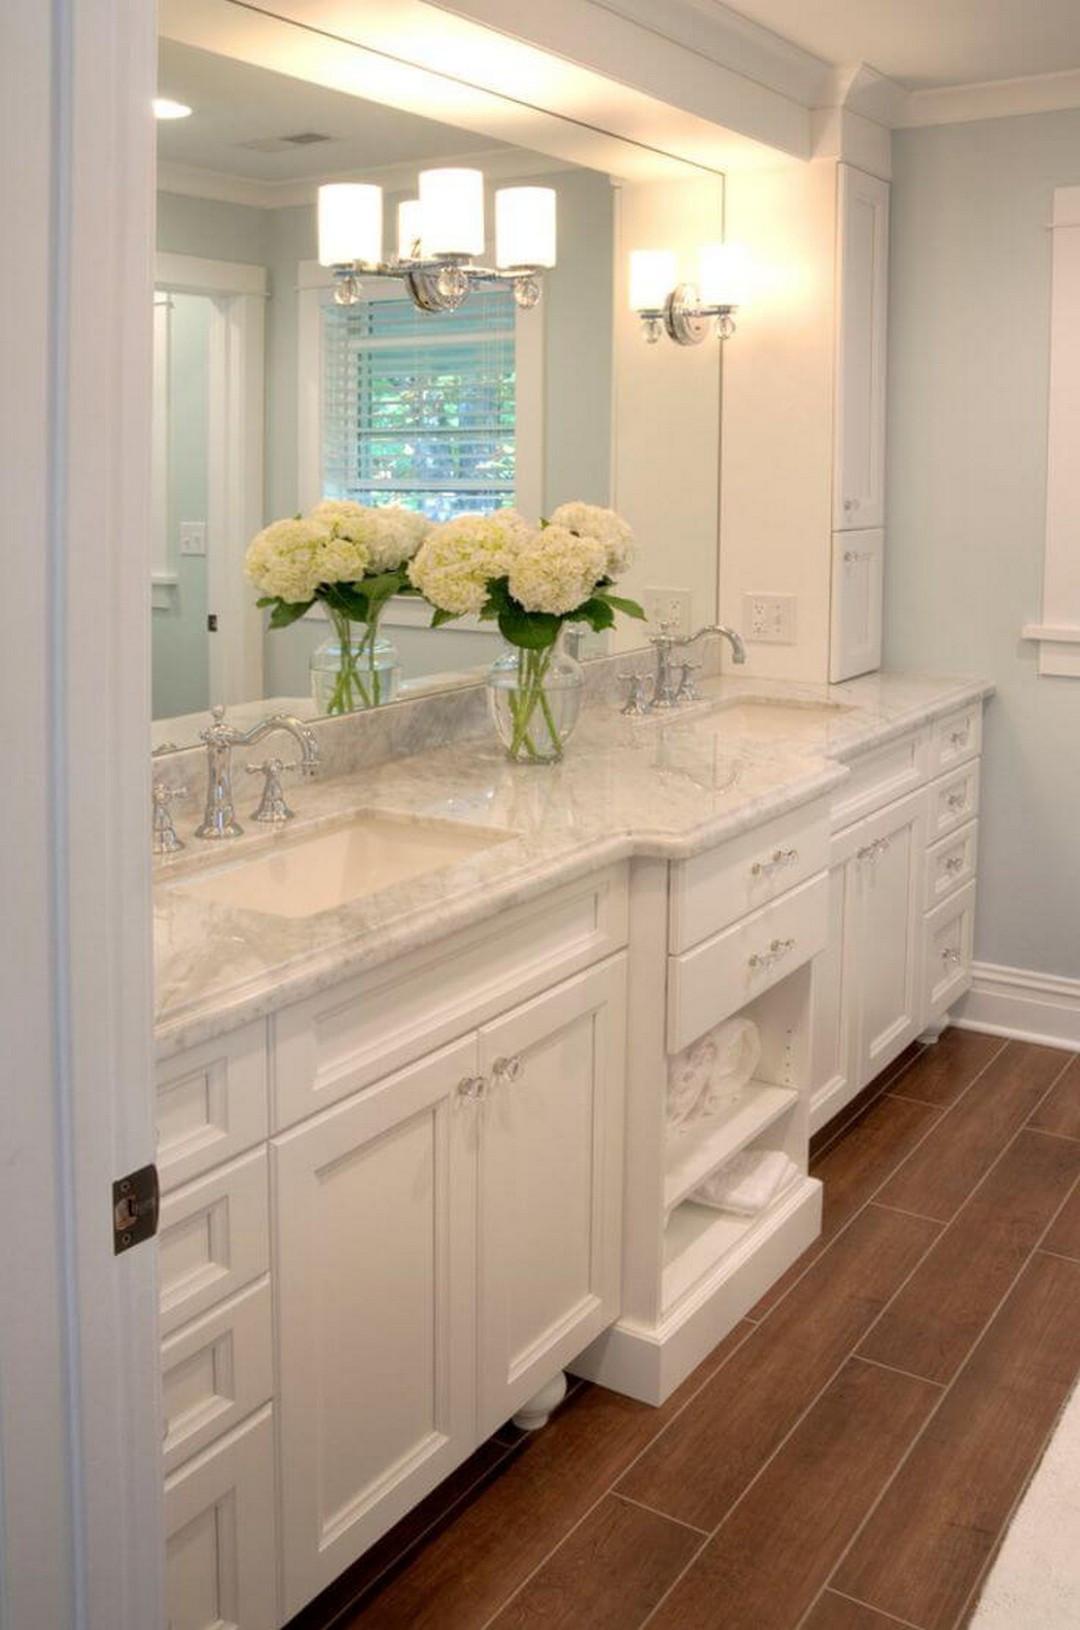 Farmhouse Master Bathroom  Urban Farmhouse Master Bathroom Remodel GoodNewsArchitecture